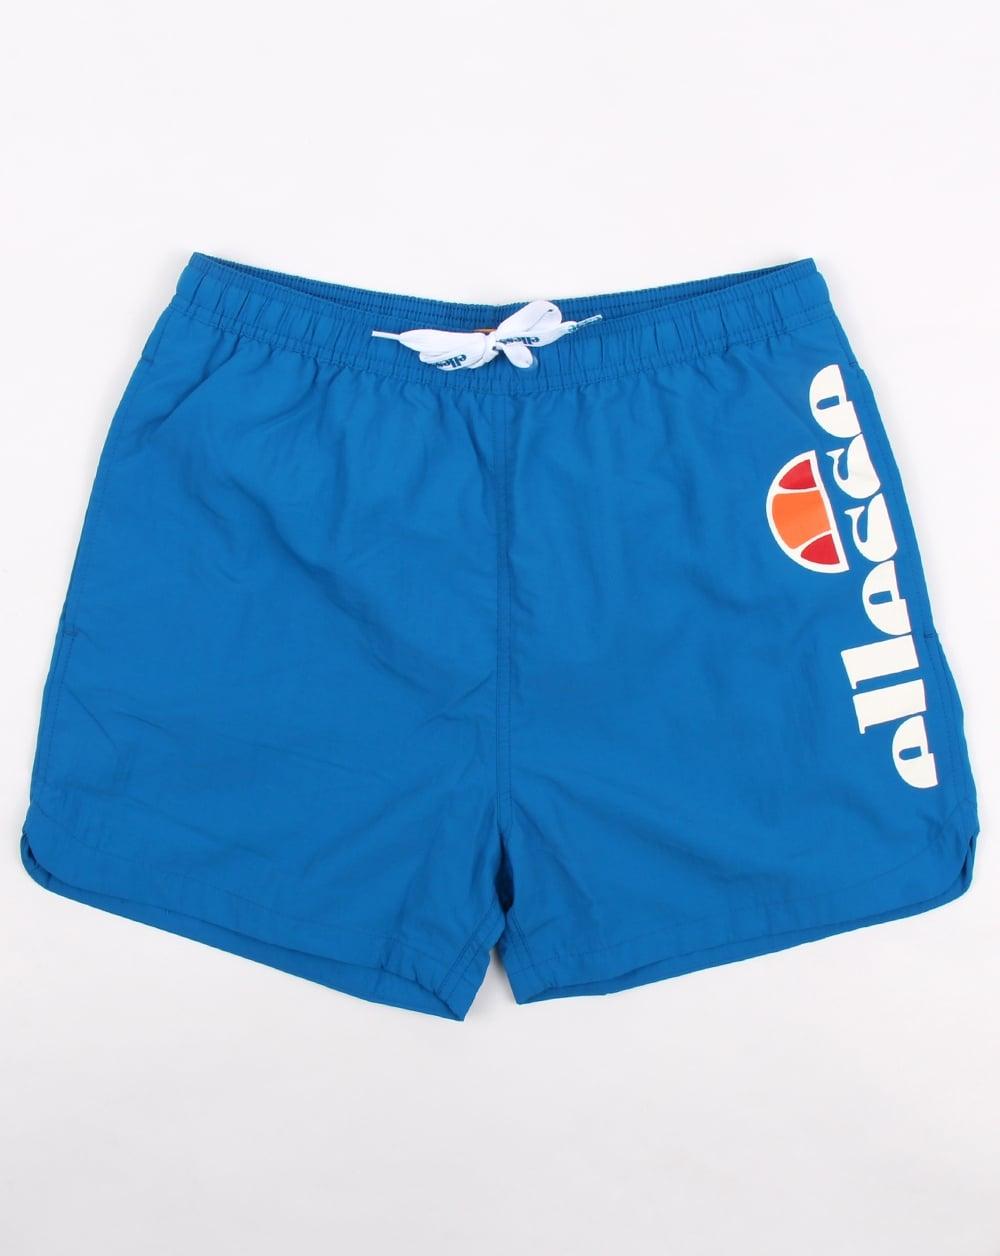 Ellesse Vito Swim Shorts Imperial Blue